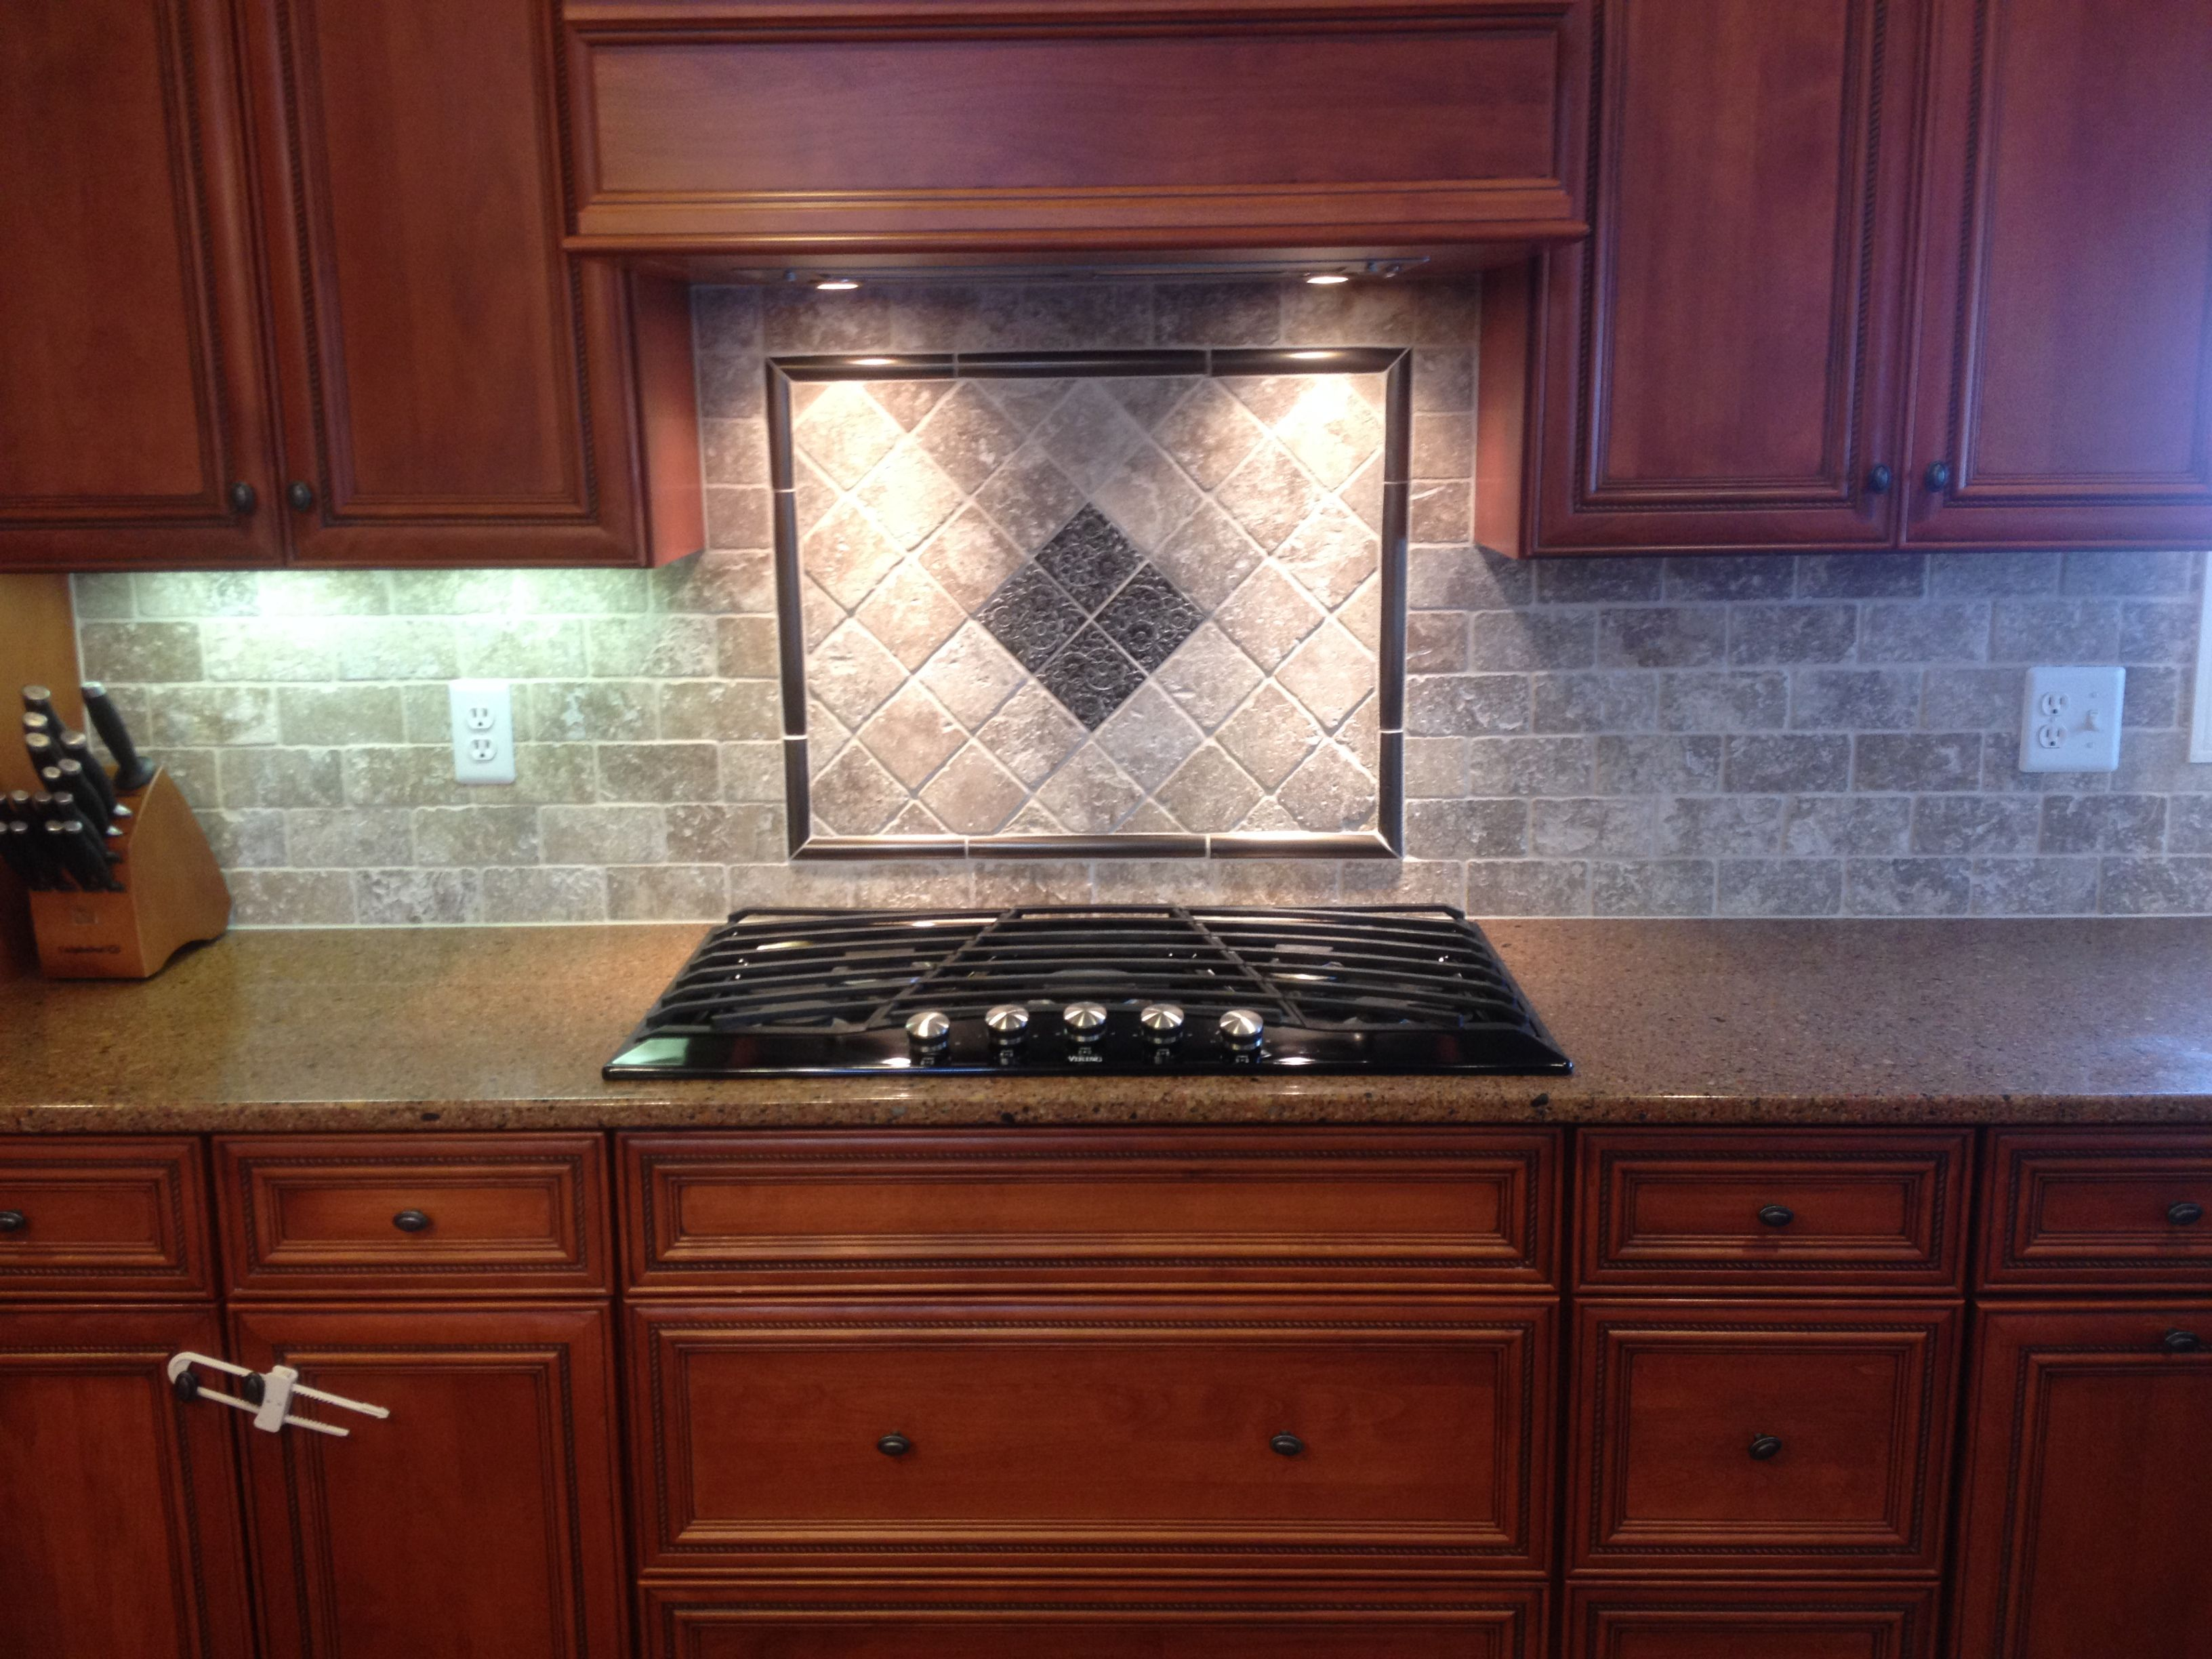 New tile backsplash with mosaic design behind cooktop kitchens new tile backsplash with mosaic design behind cooktop dailygadgetfo Gallery